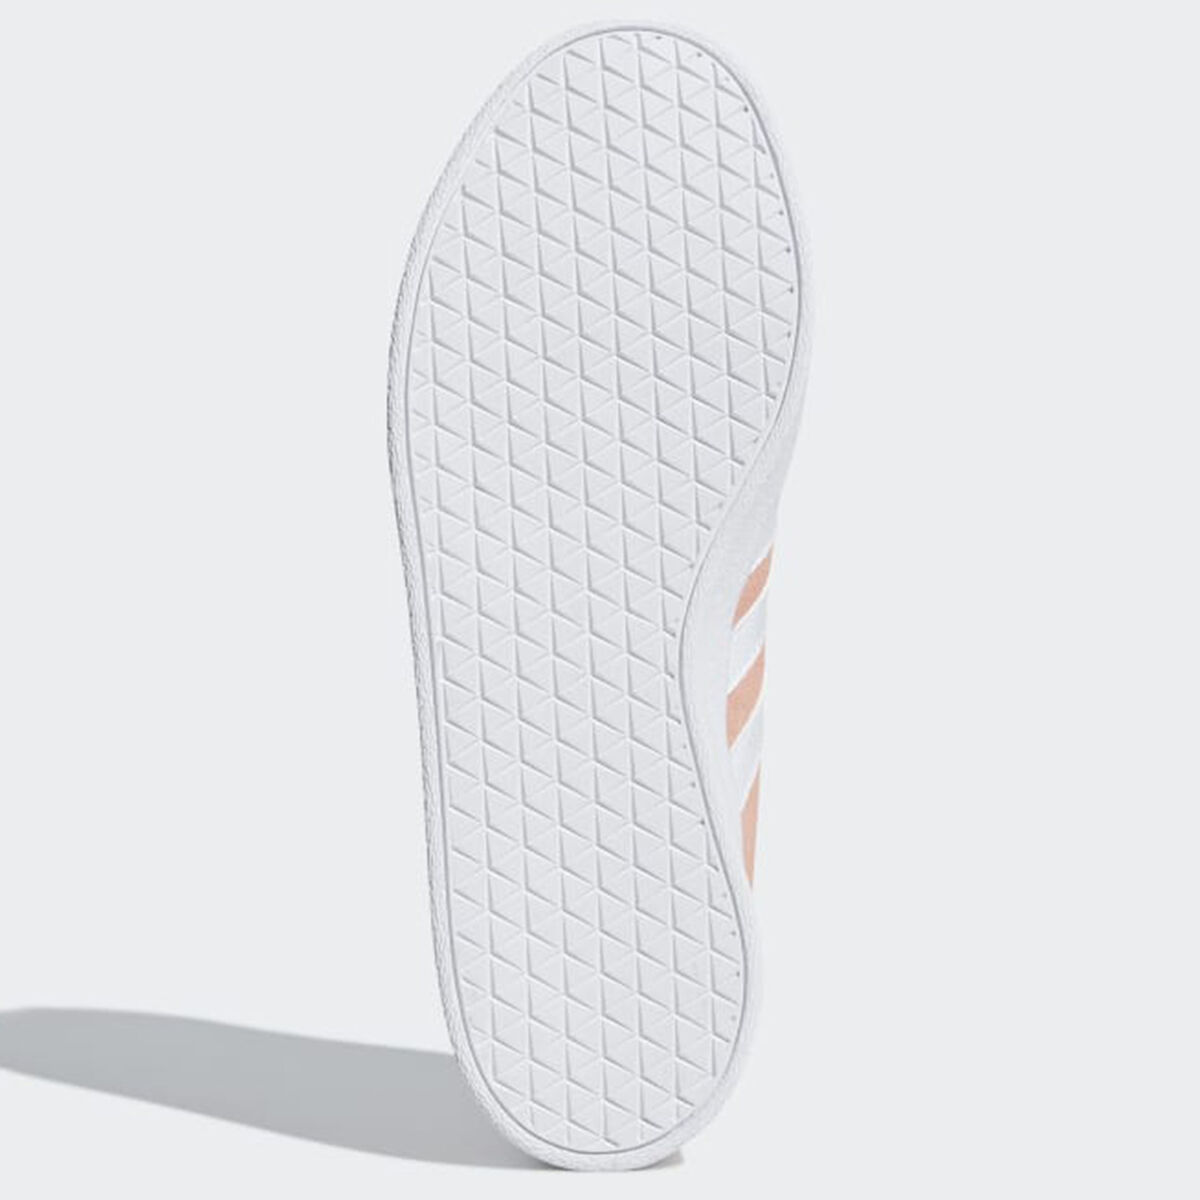 Zapatilla Mujer Adidas Vl Court 2.0